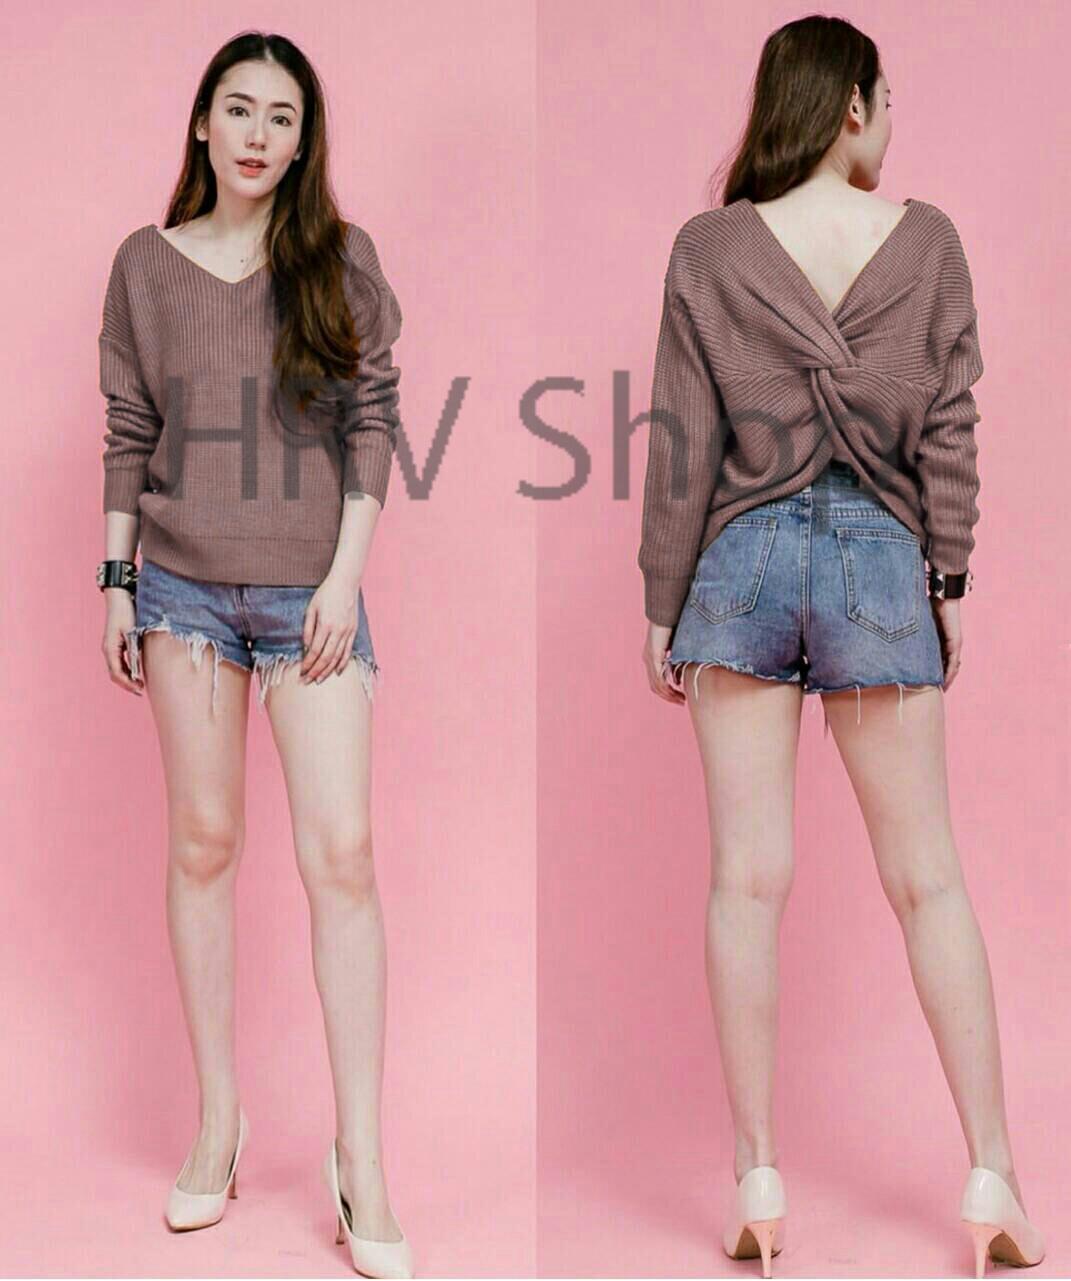 HRV Shop Blouse Wanita Tamani   Baju Wanita   Blouse Korea   Atasan Wanita    Baju c462803b6b